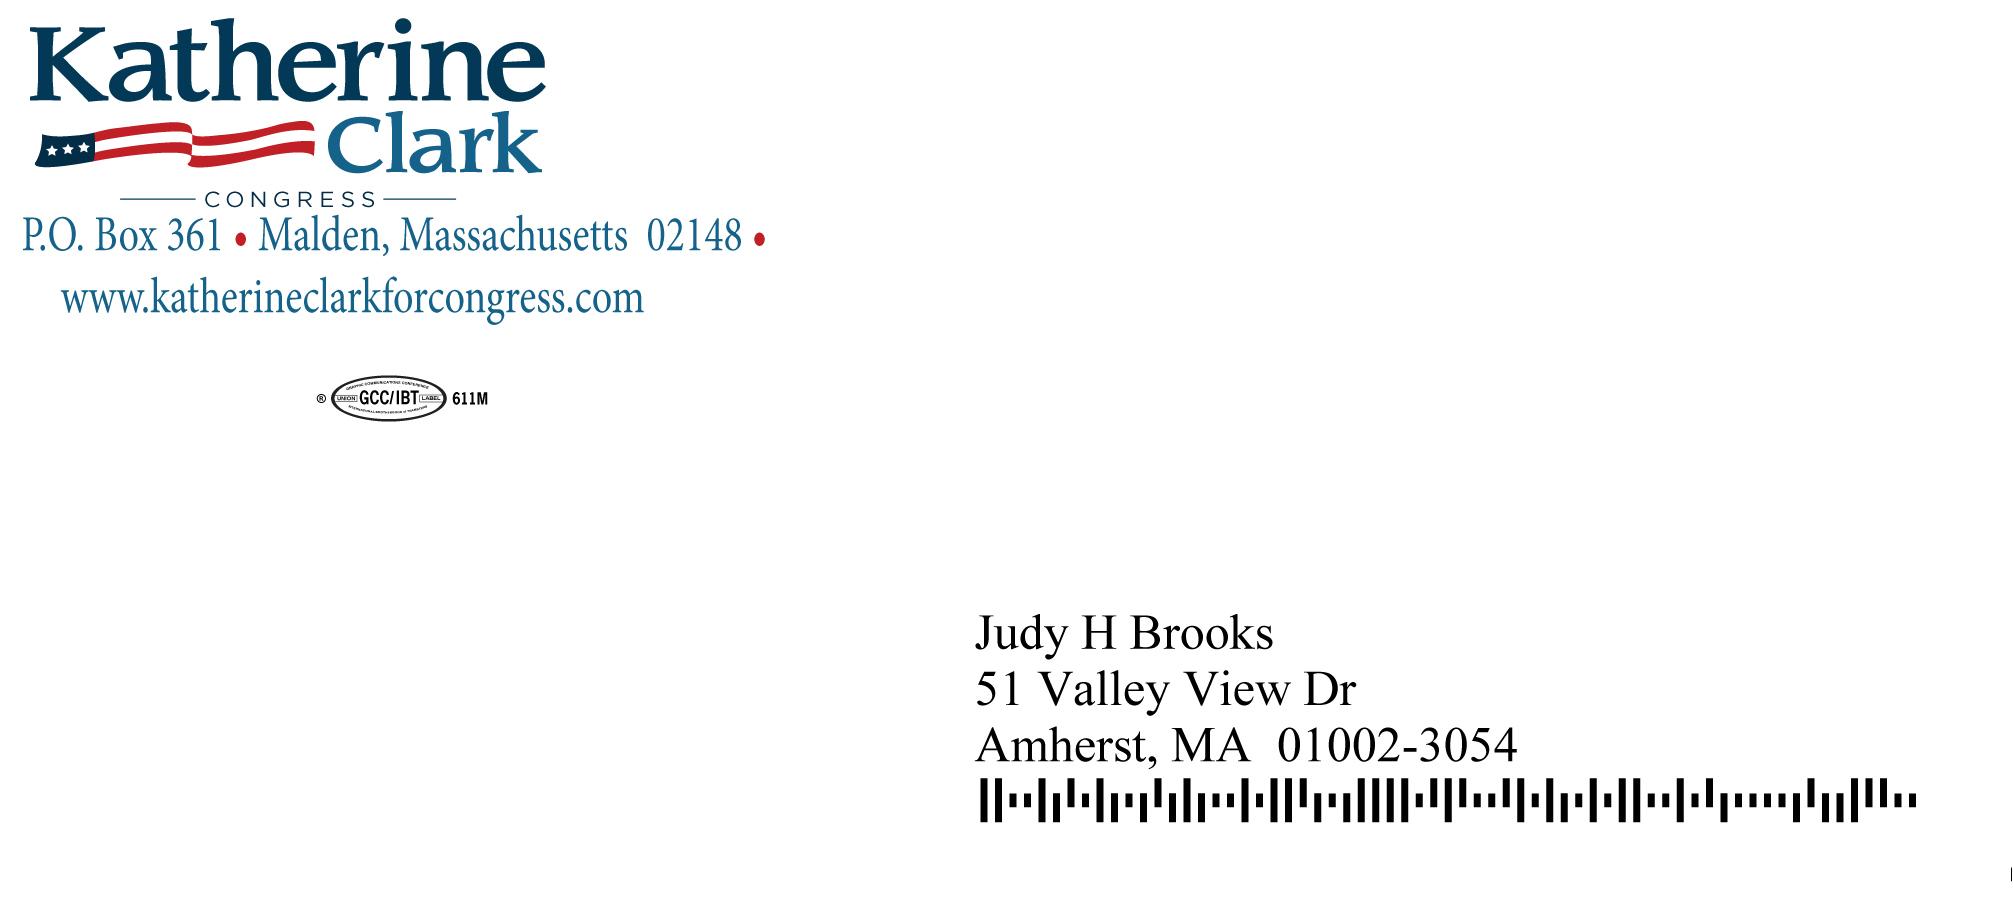 Mailing 2 Envelope